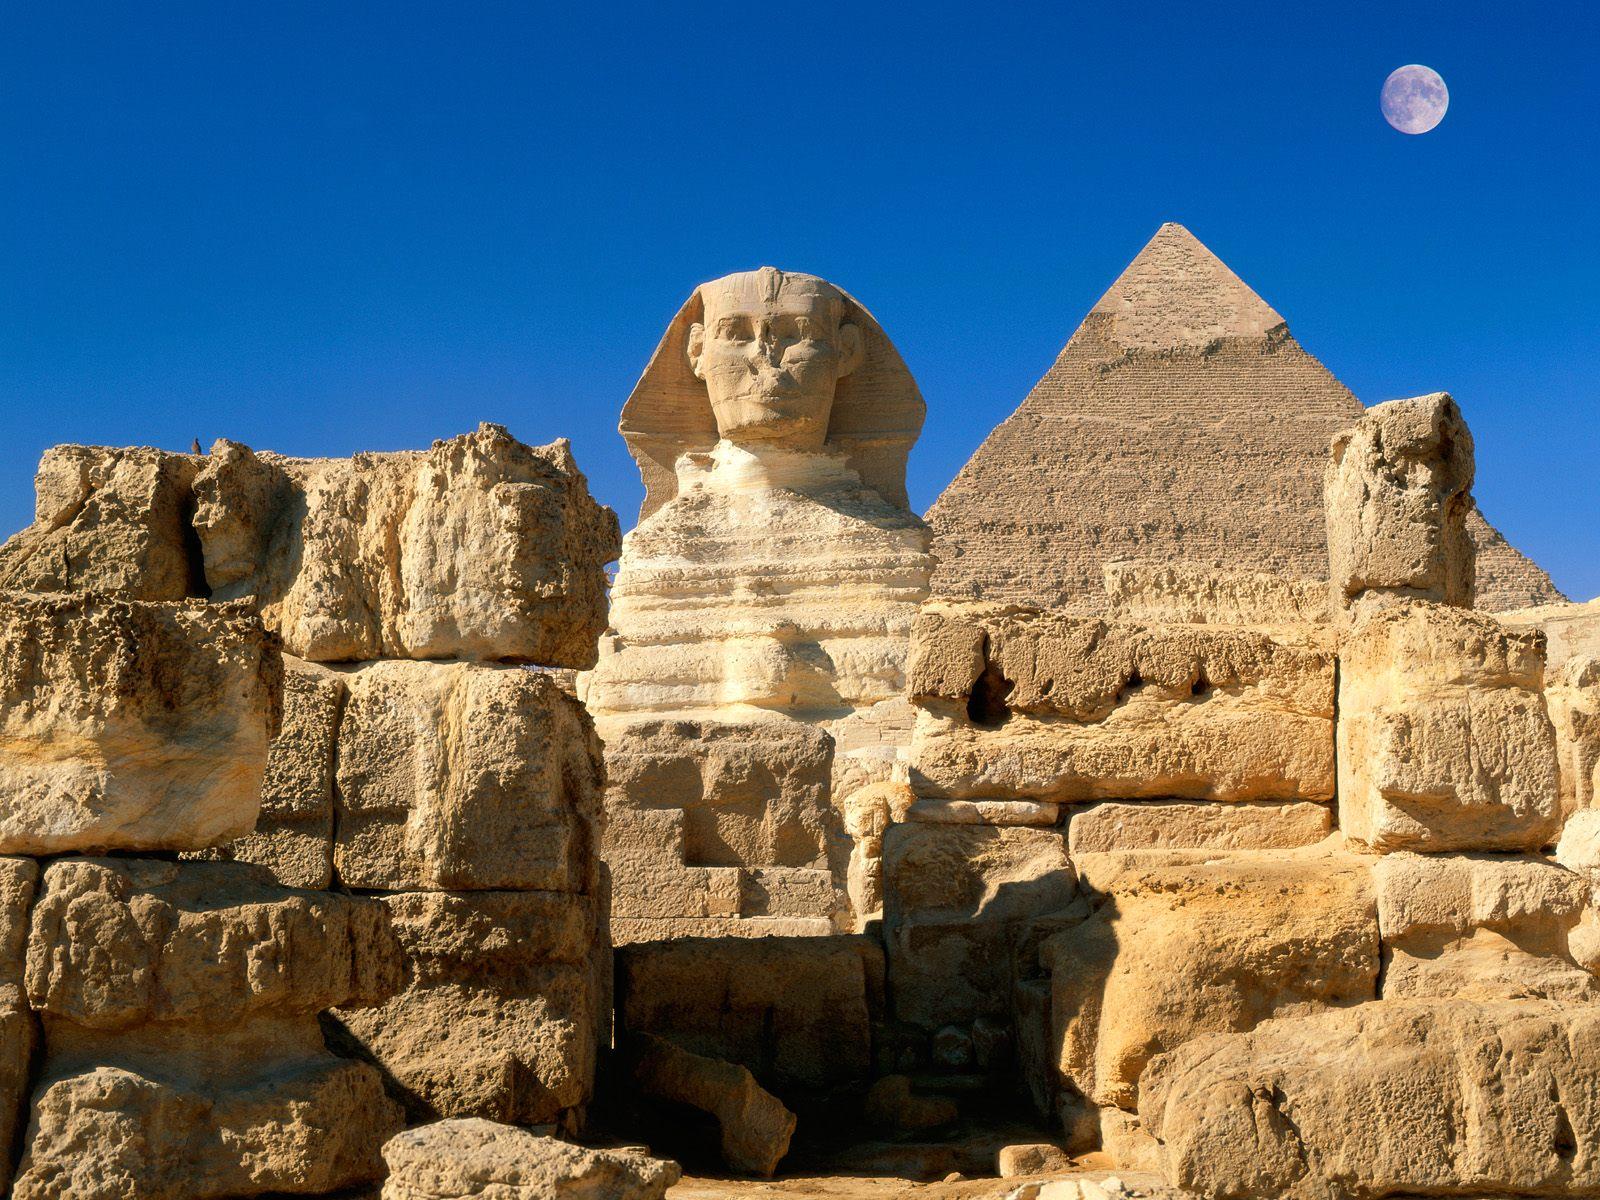 Pyramids Hd Wallpapers Wallpaper202